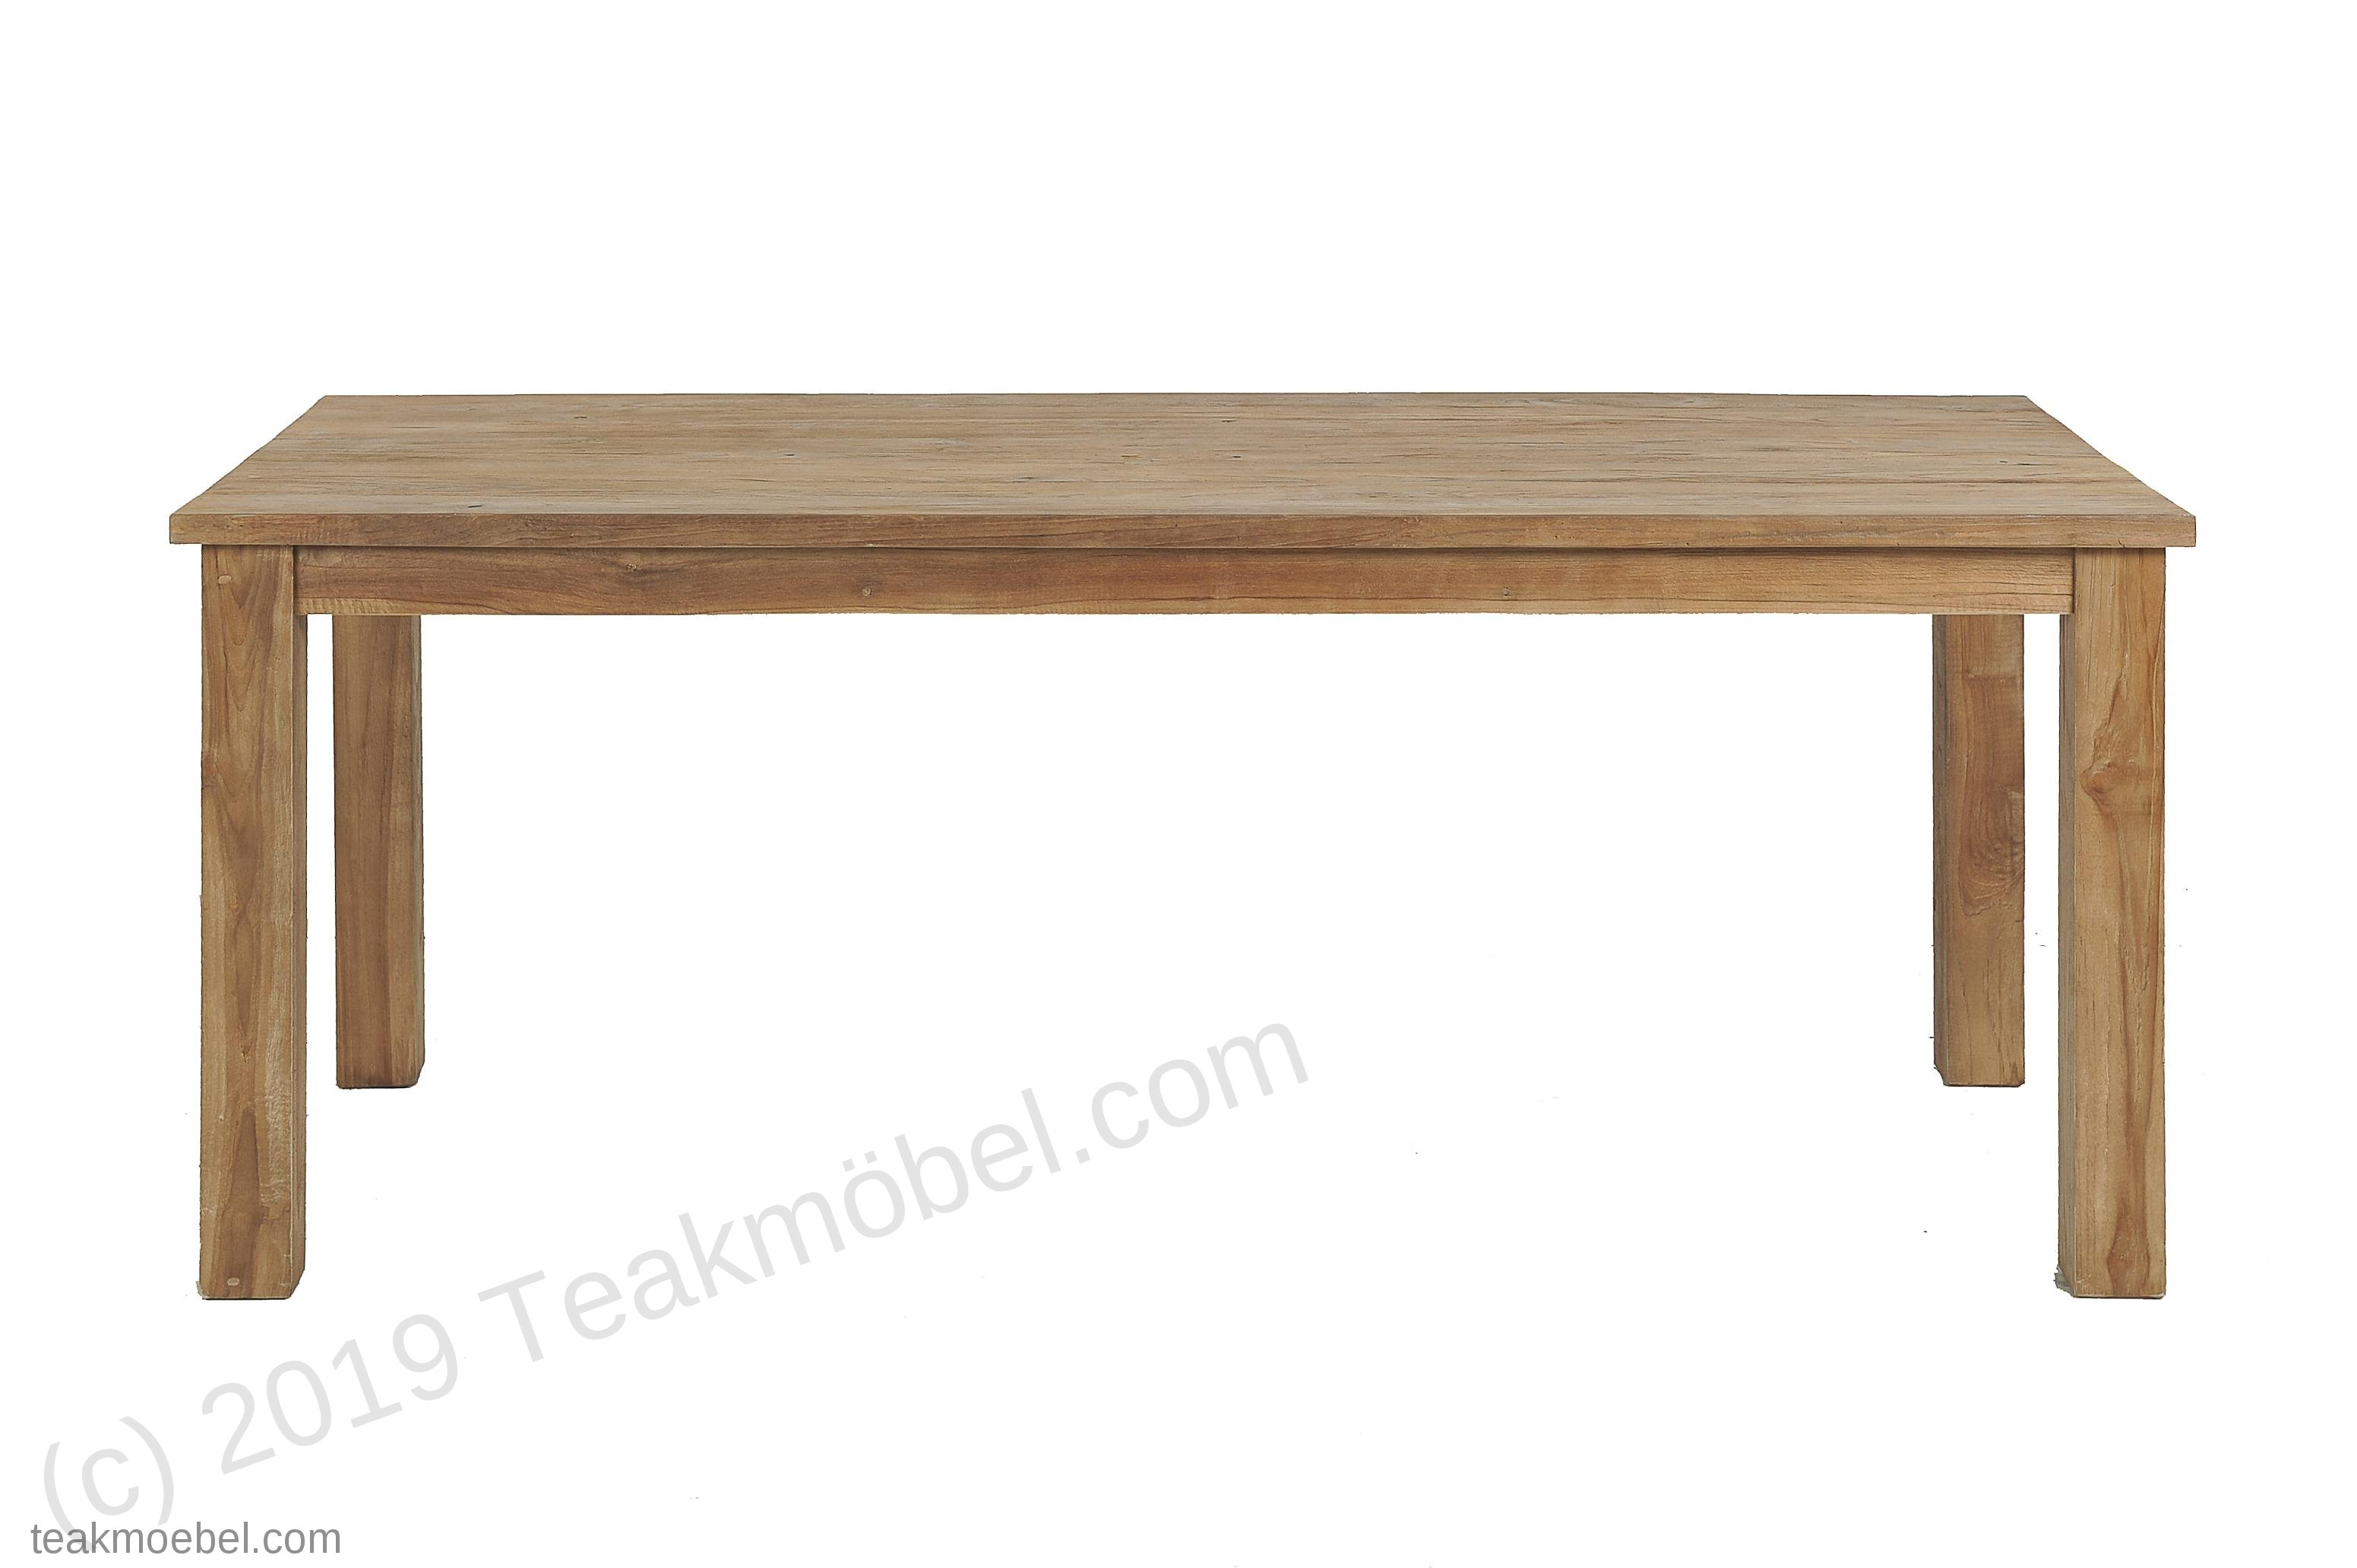 teak tisch geb rstet 200 x 100 teakm. Black Bedroom Furniture Sets. Home Design Ideas